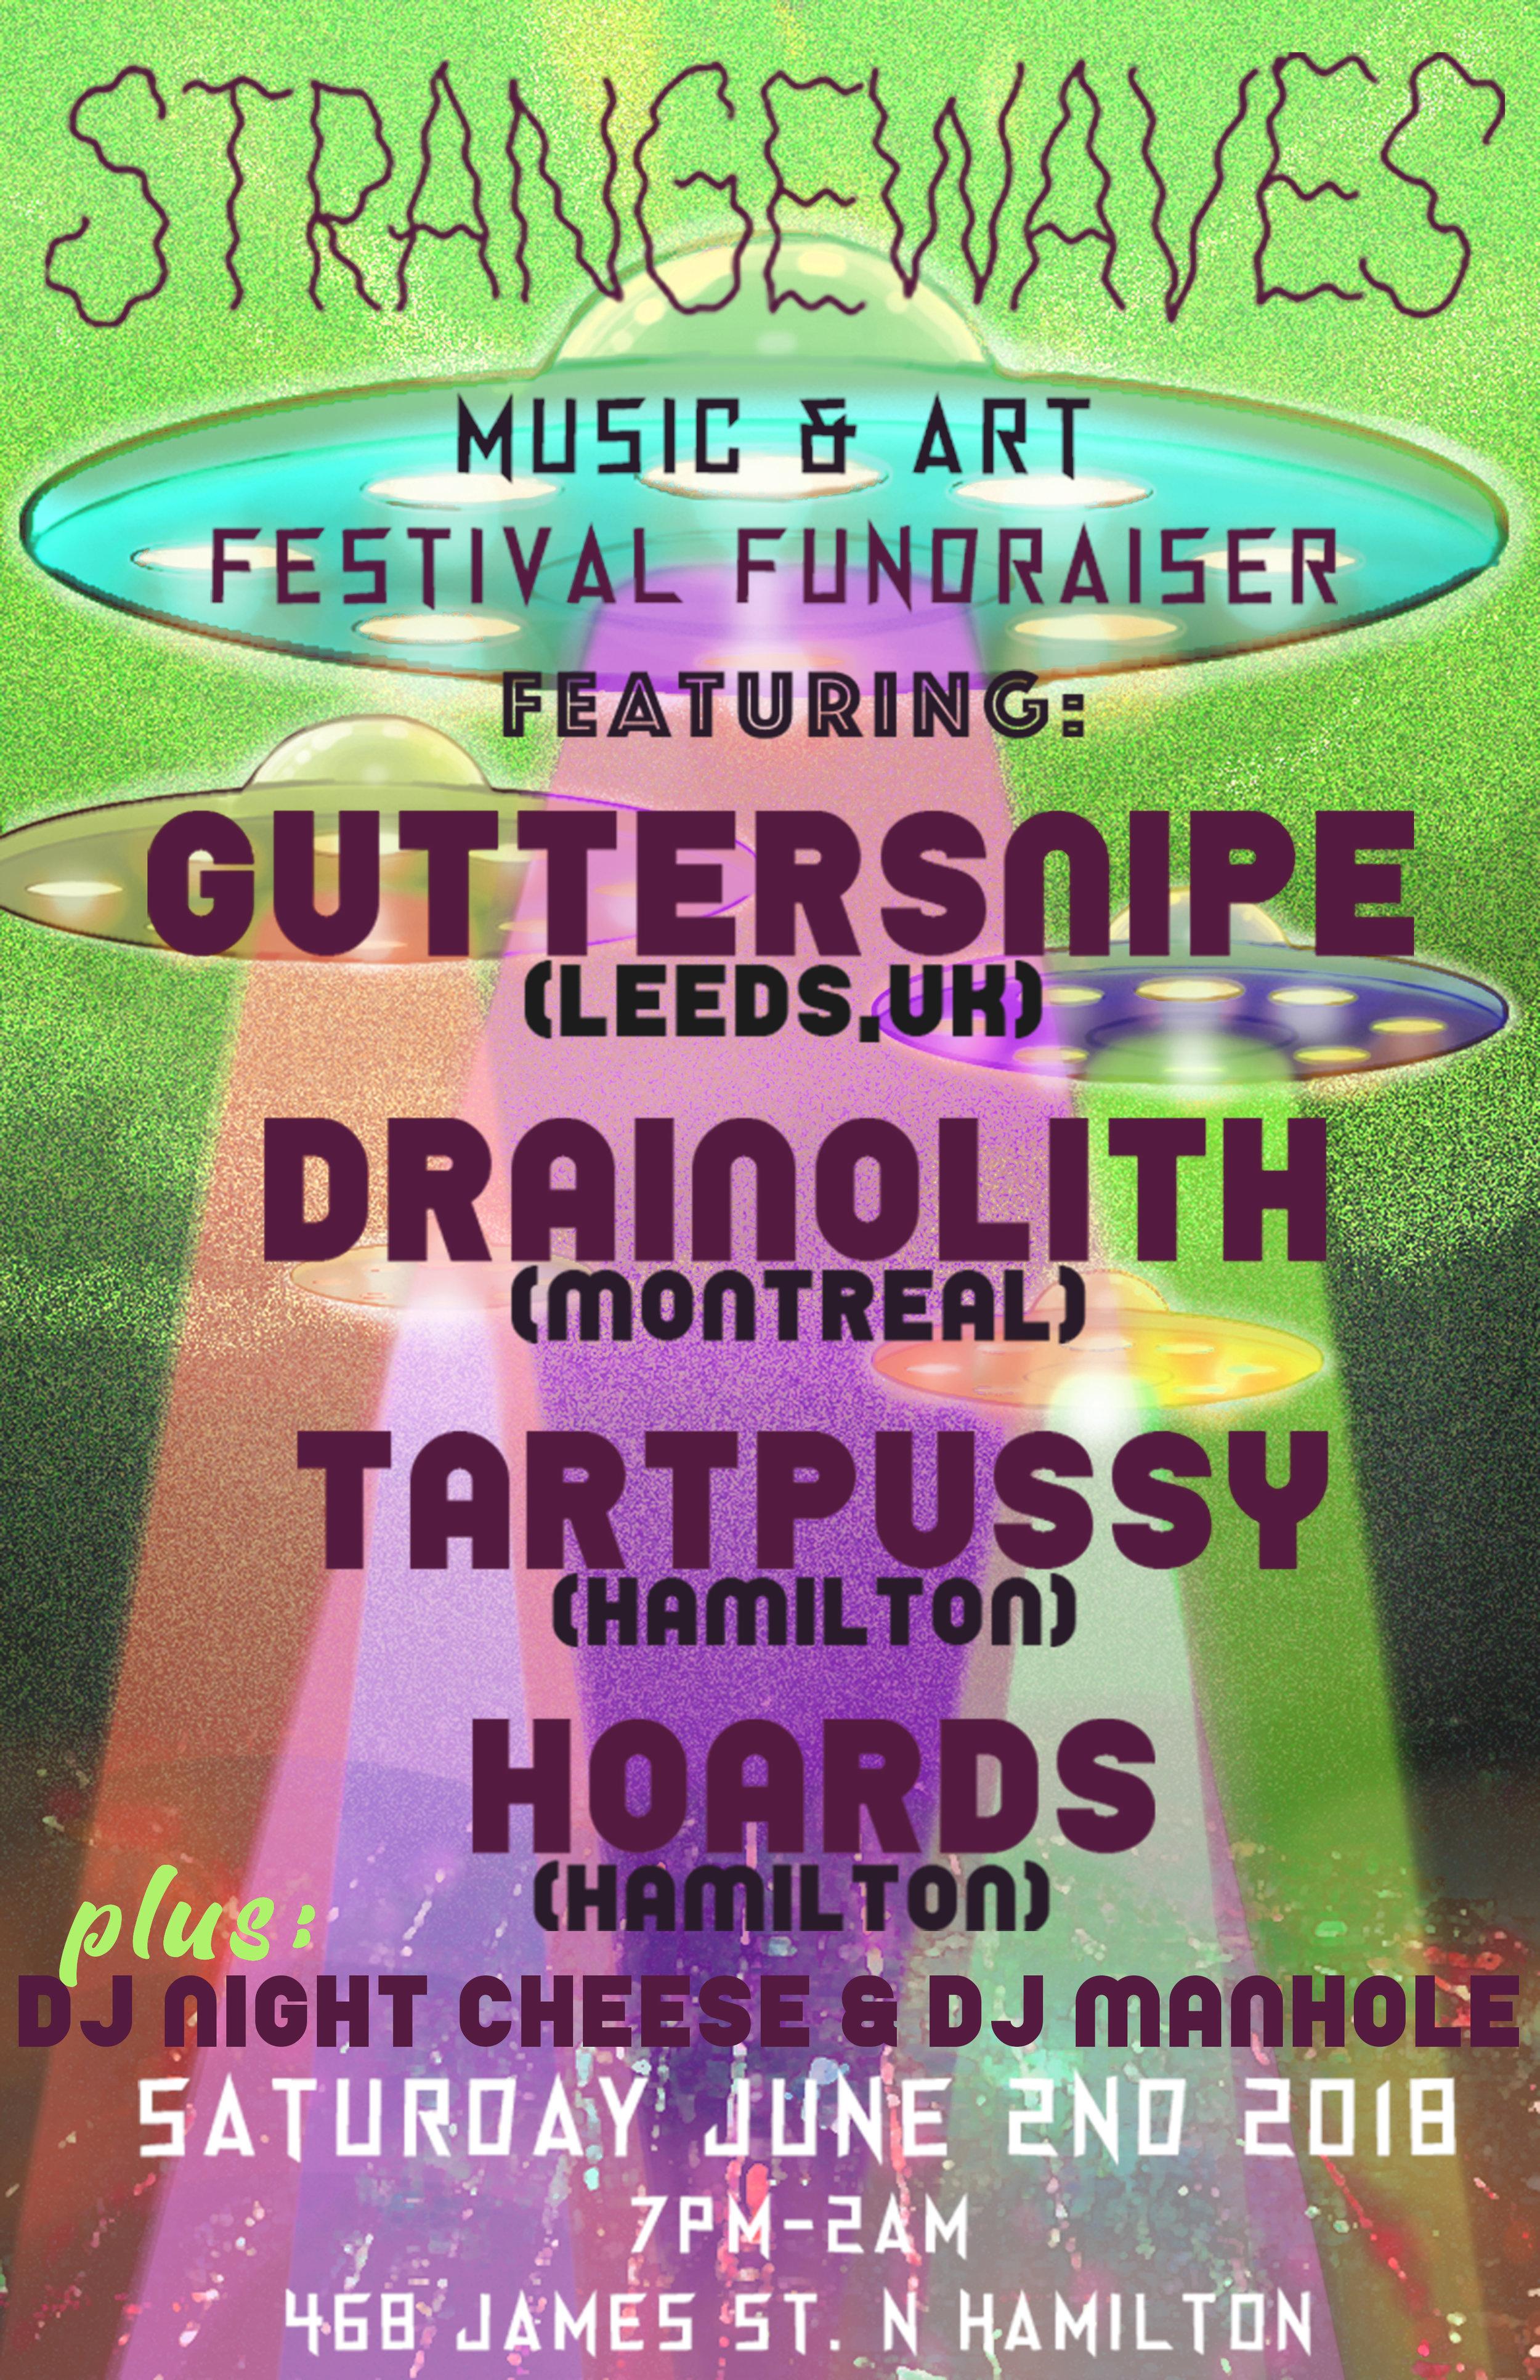 Strangewaves Fundraiser: Guttersnipe/Drainolith/Tartpussy/Hoards  @Home:Front